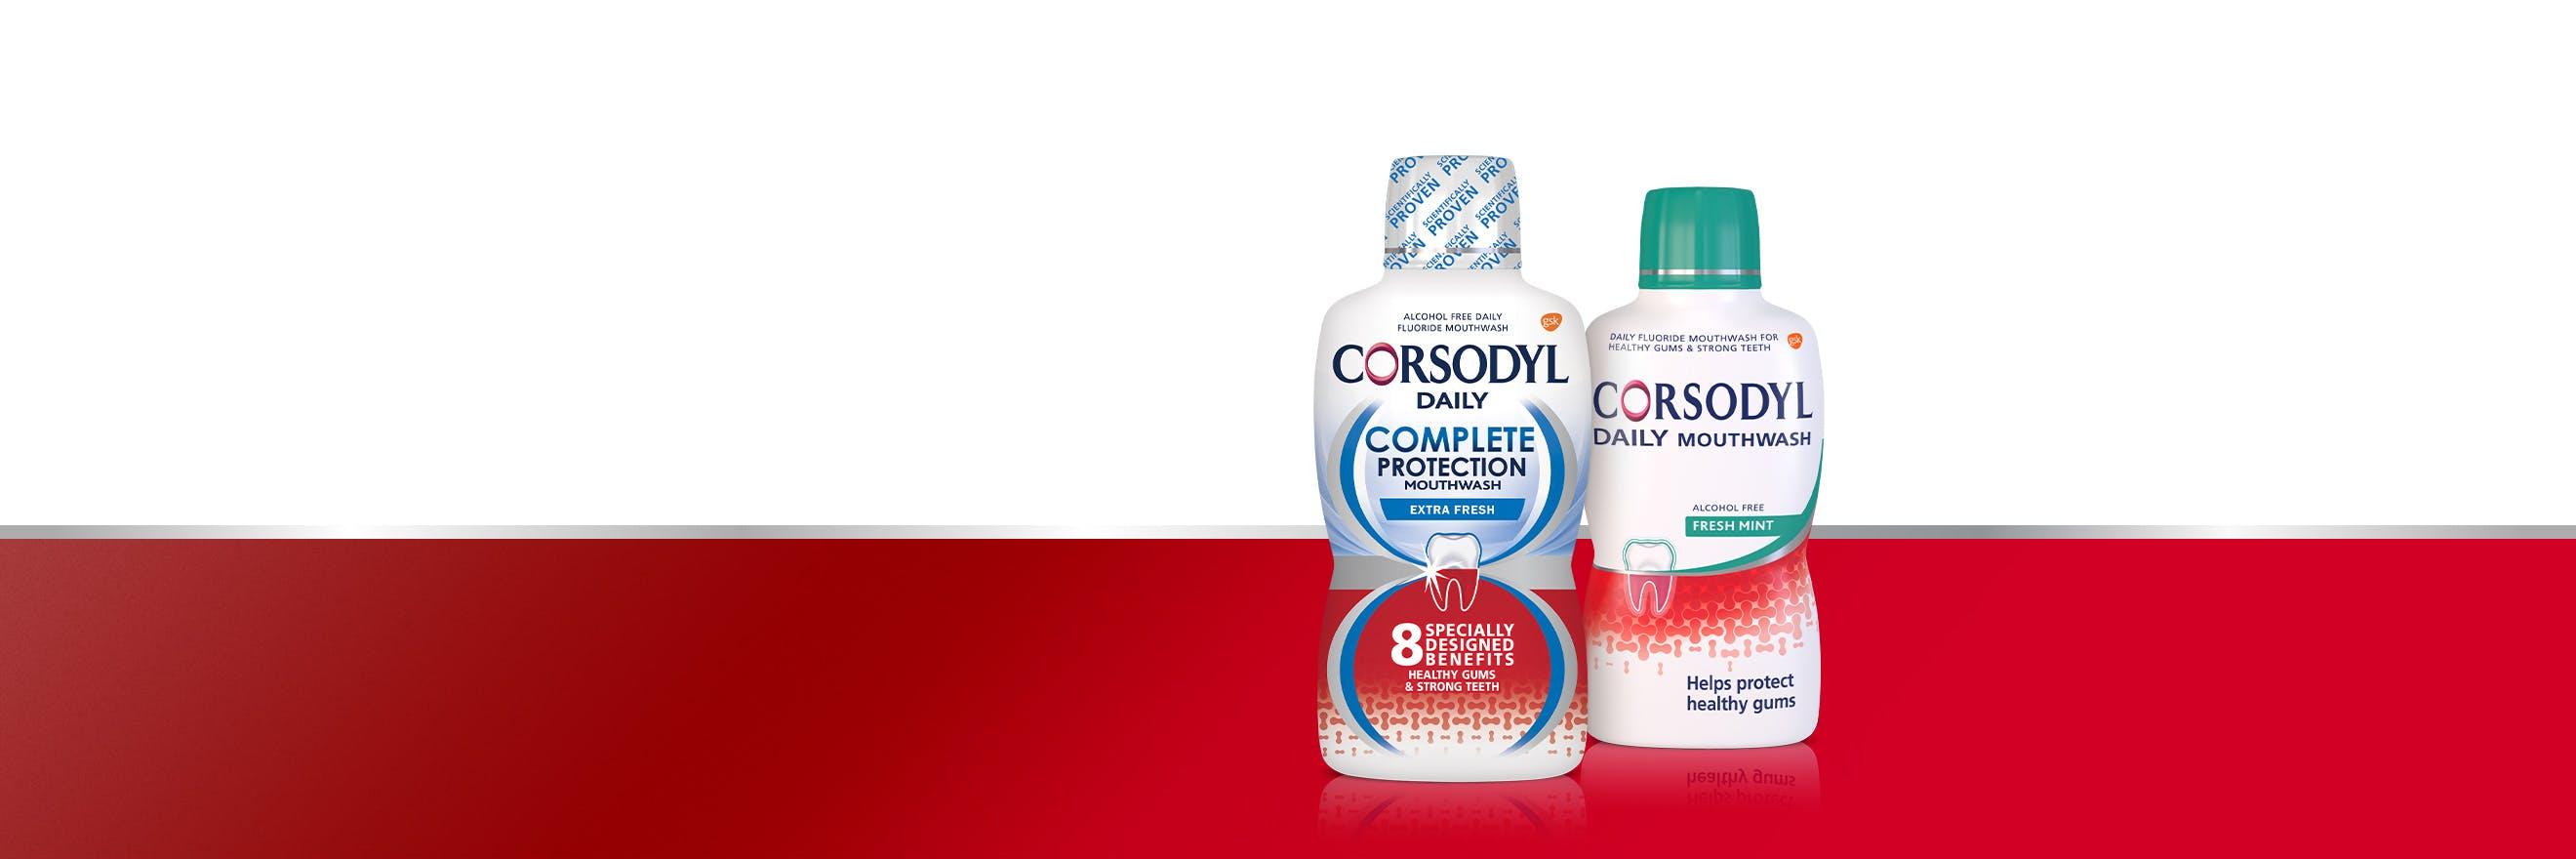 Corsodyl Mouthwash range